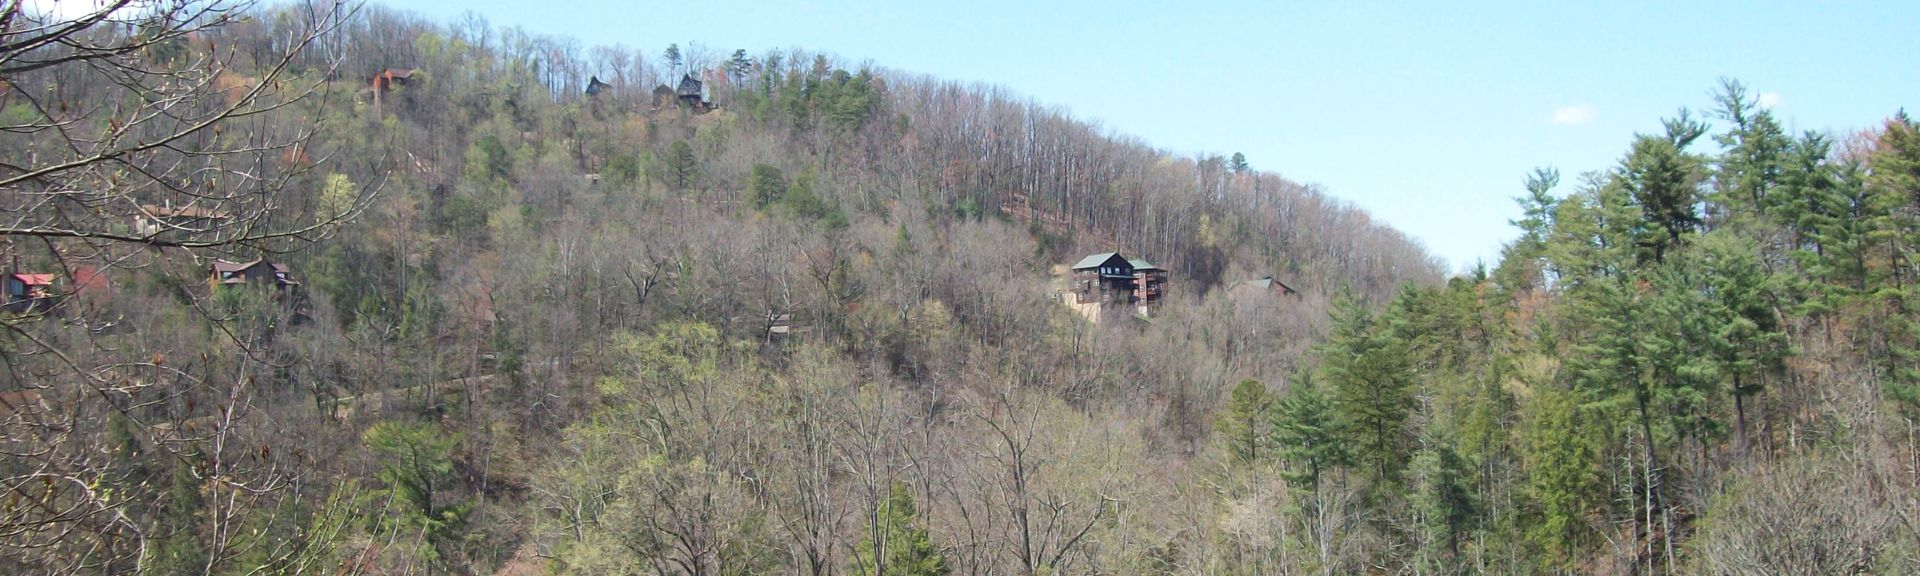 Gatlinburg Chateau Condos, Gatlinburg, Tennessee, United States of America